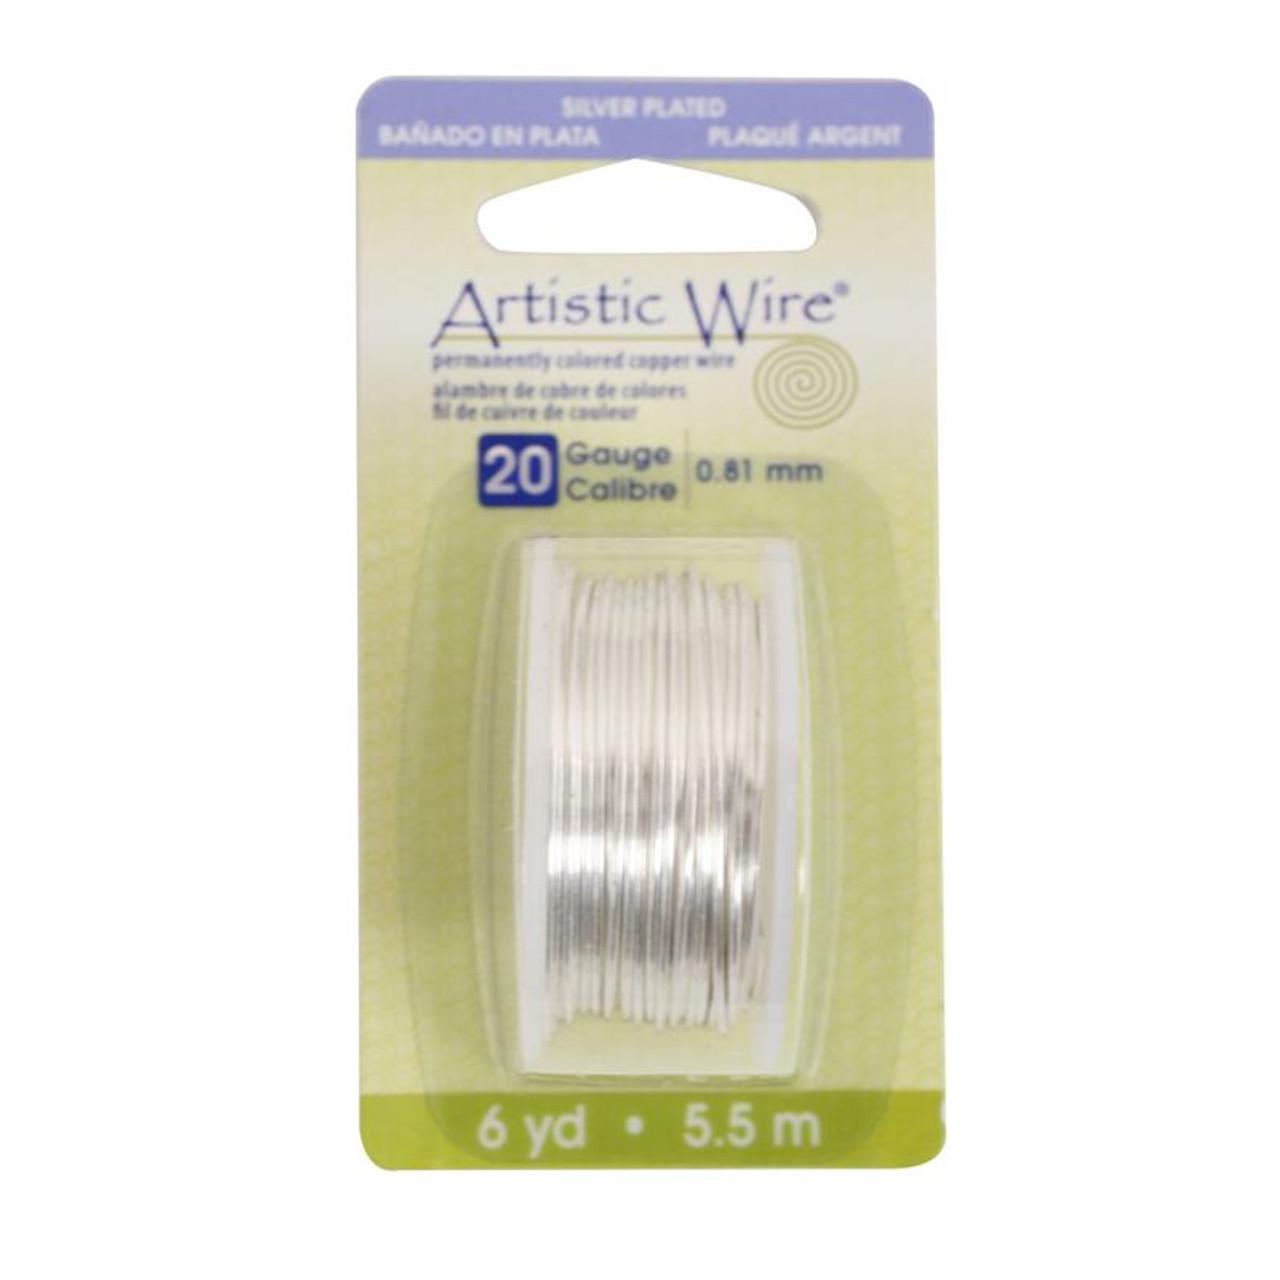 Artistic Wire 20 Gauge Silver Color Craft Wire Silver Plated Copper Non Tarnish